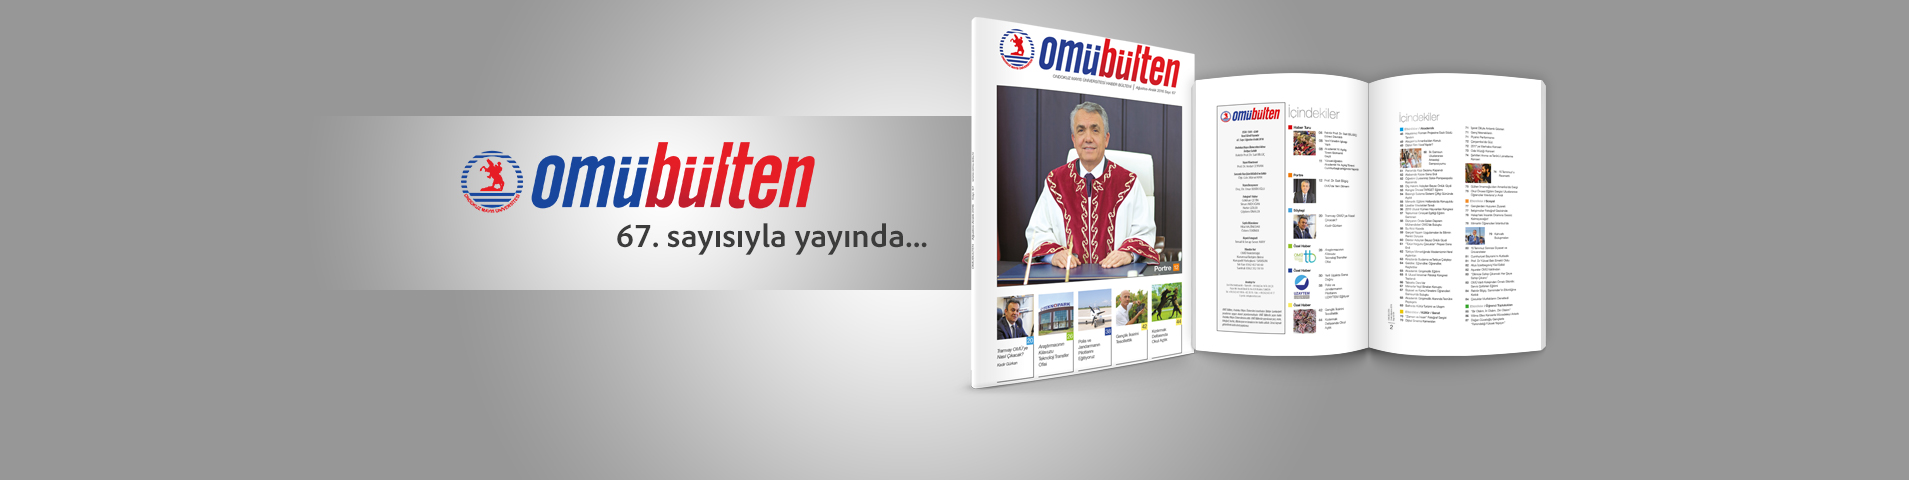 http://www.omu.edu.tr/sites/default/files/files/omu_bulten_67._sayisiyla_yayinda./omubulten67-slider.jpg